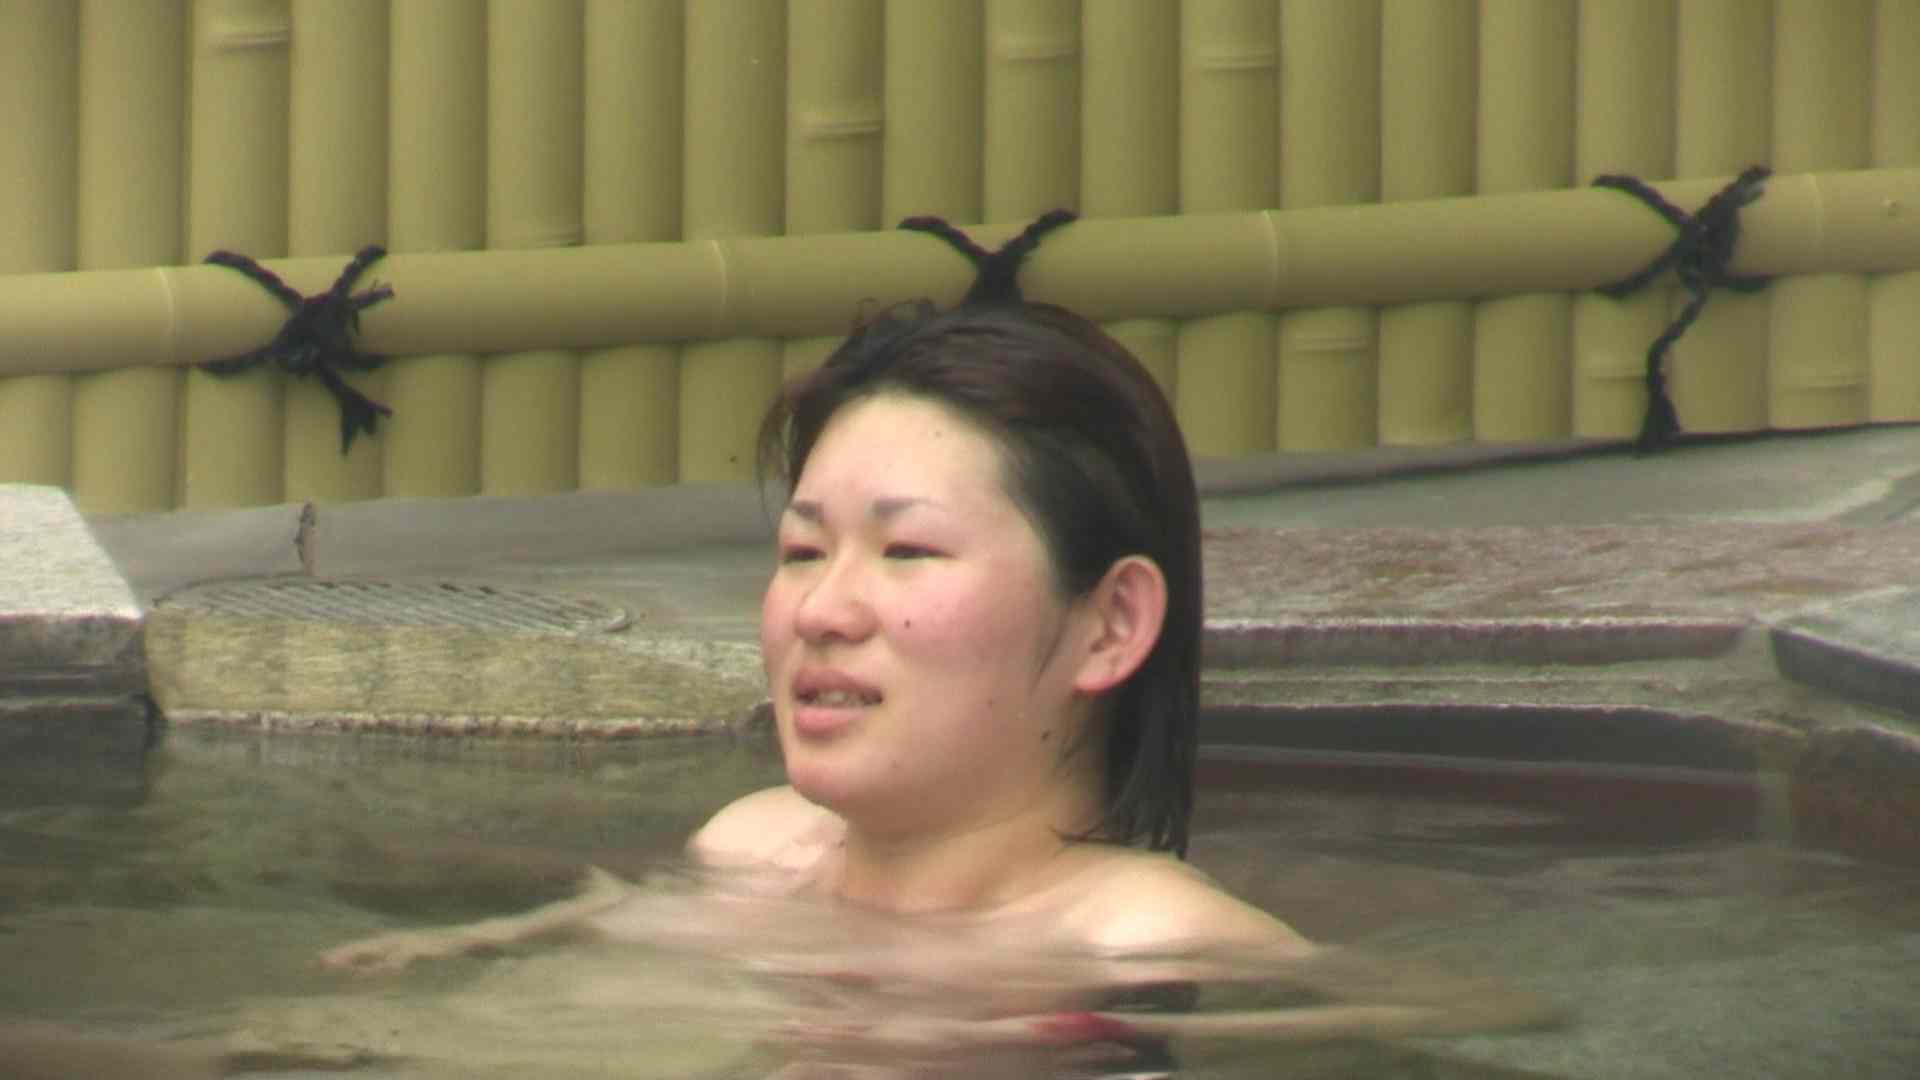 Aquaな露天風呂Vol.673 露天風呂突入 盗み撮り動画キャプチャ 99pic 53